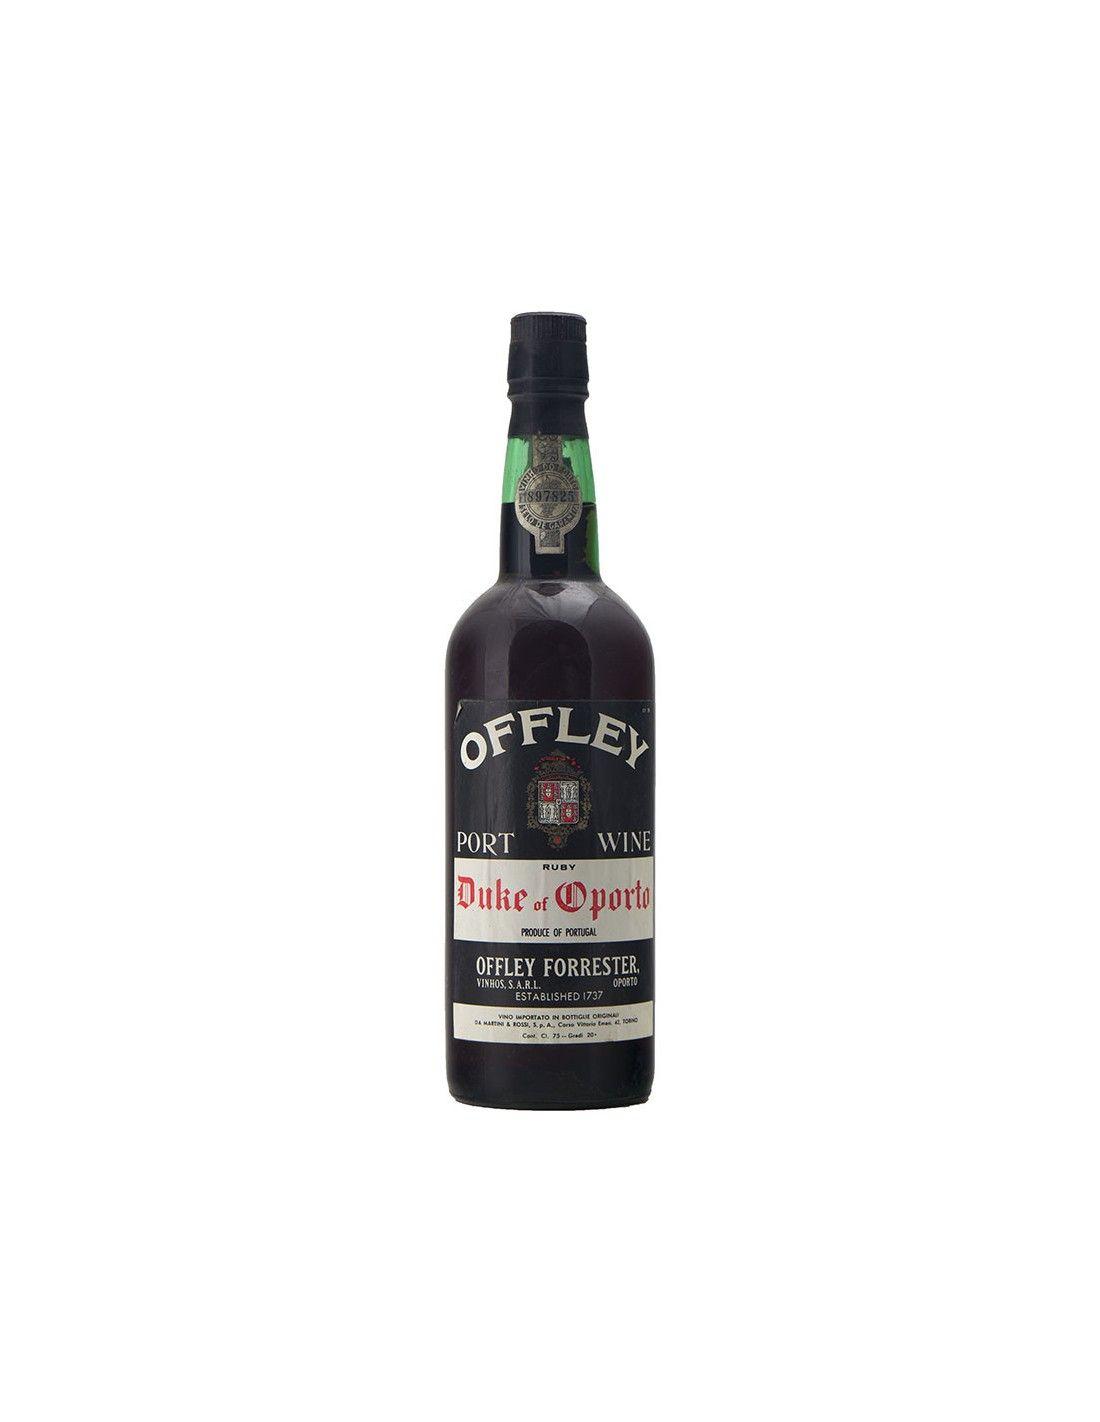 PORT RUBY DUKE OF OPORTO NV OFFLEY FORRESTER Grandi Bottiglie